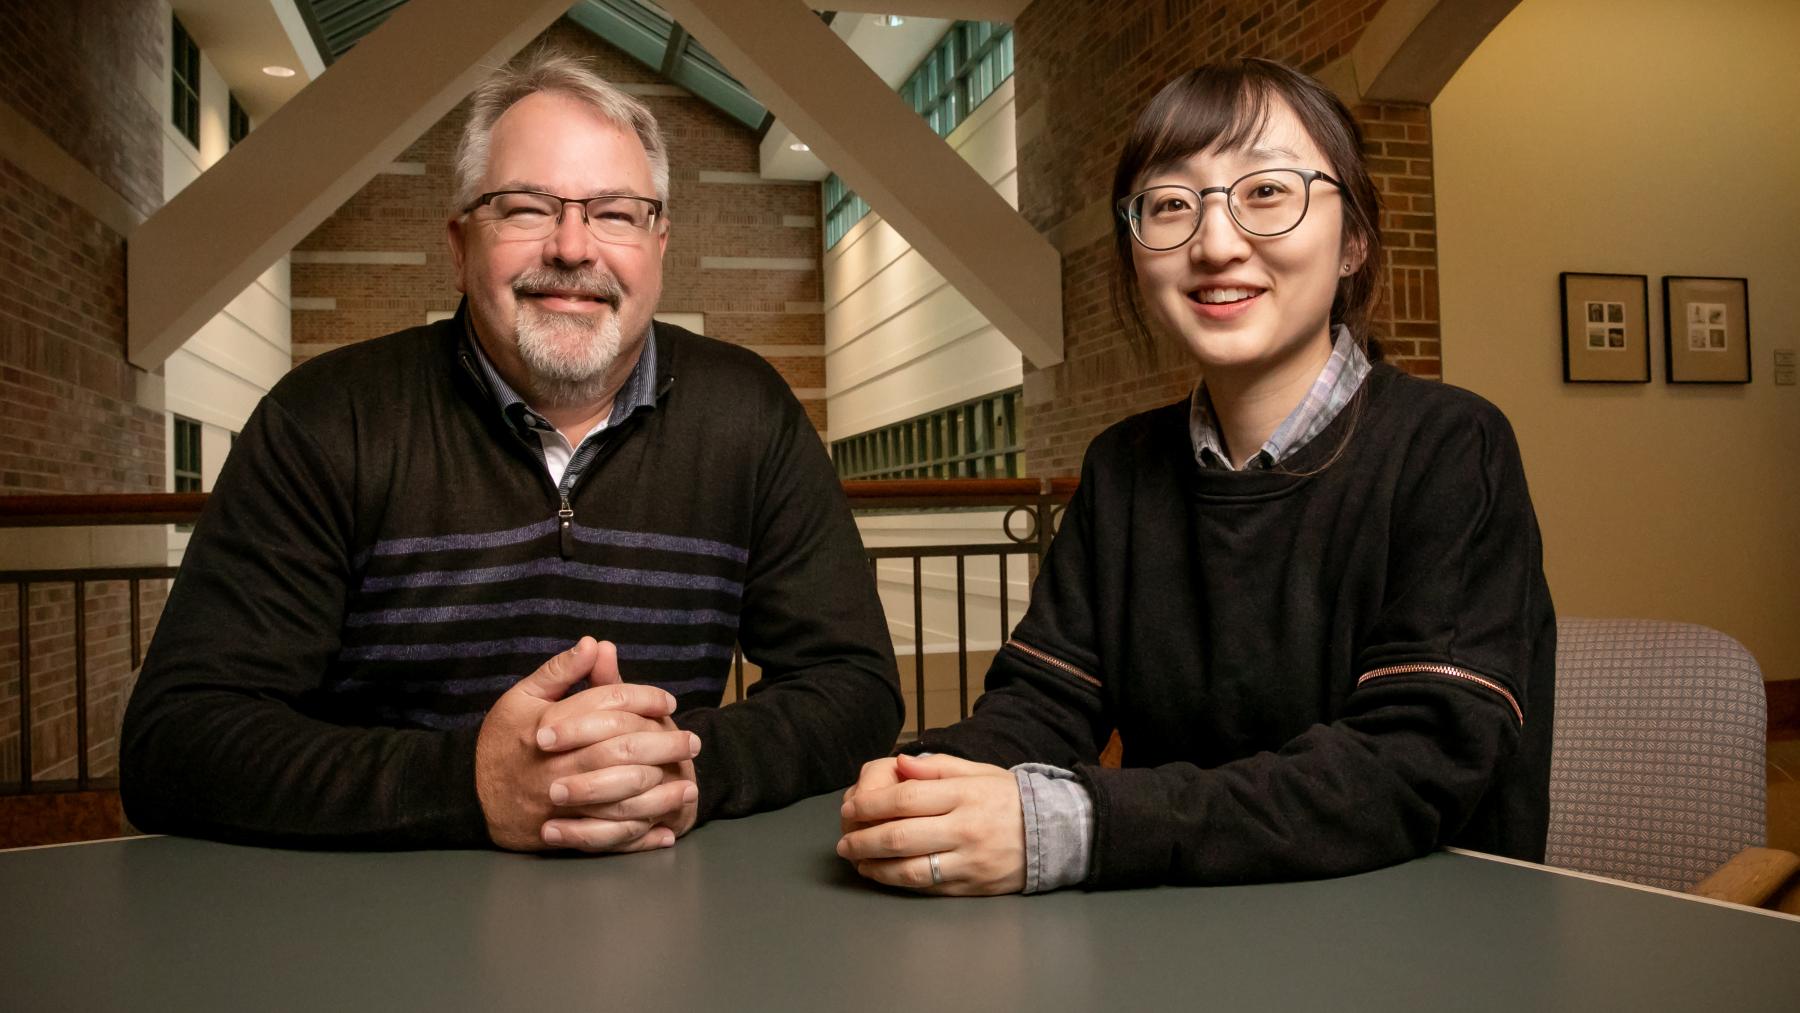 educational psychology professor Kiel Christianson and graduate student Nayoung Kim.  Photo by L. Brian Stauffer